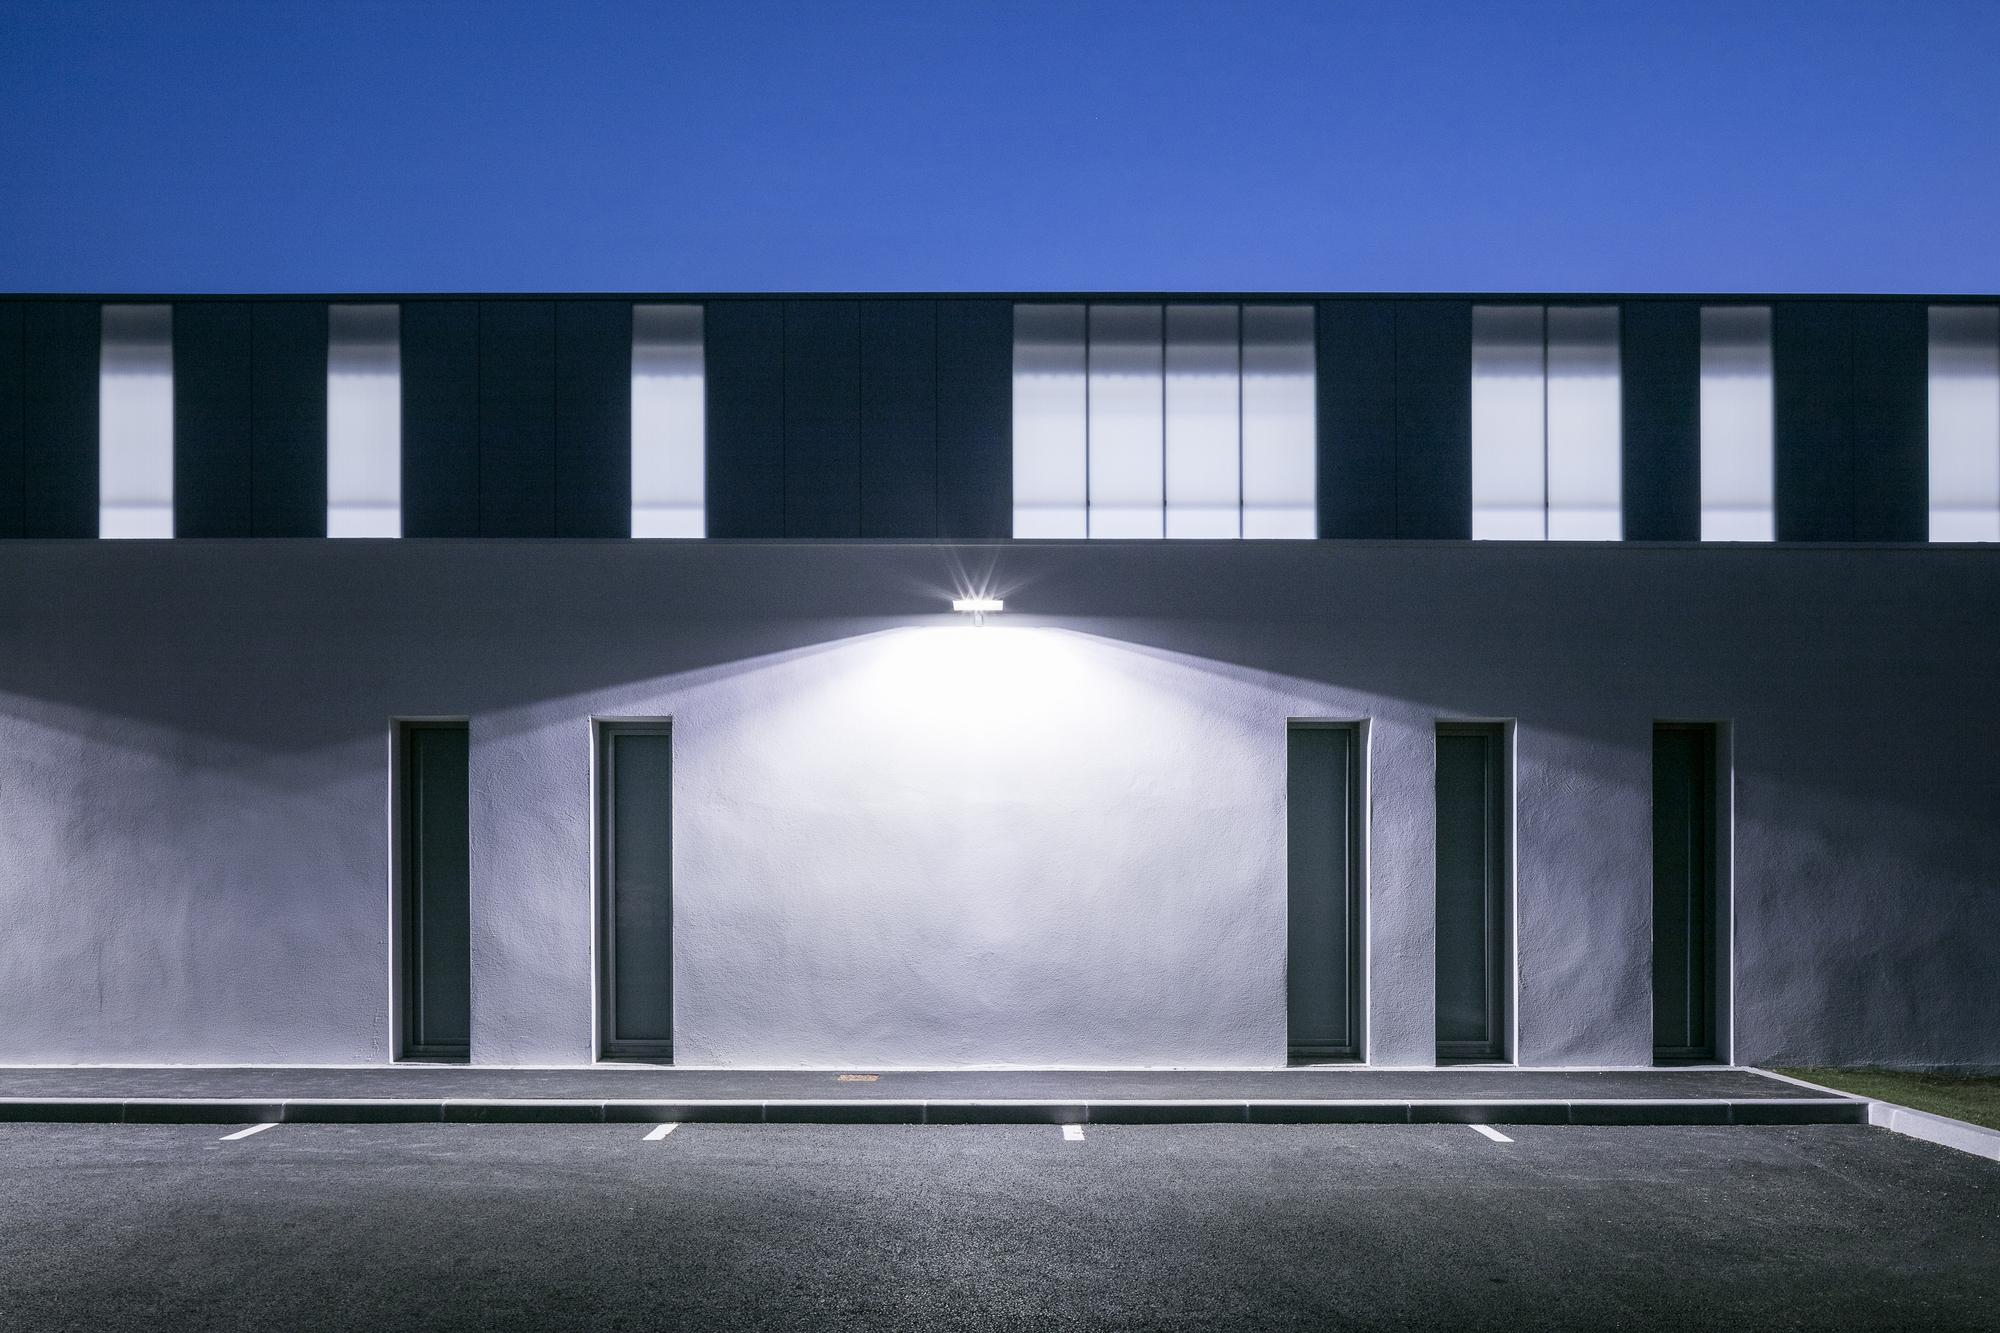 galer a de gym enoseis eno architectes 2. Black Bedroom Furniture Sets. Home Design Ideas